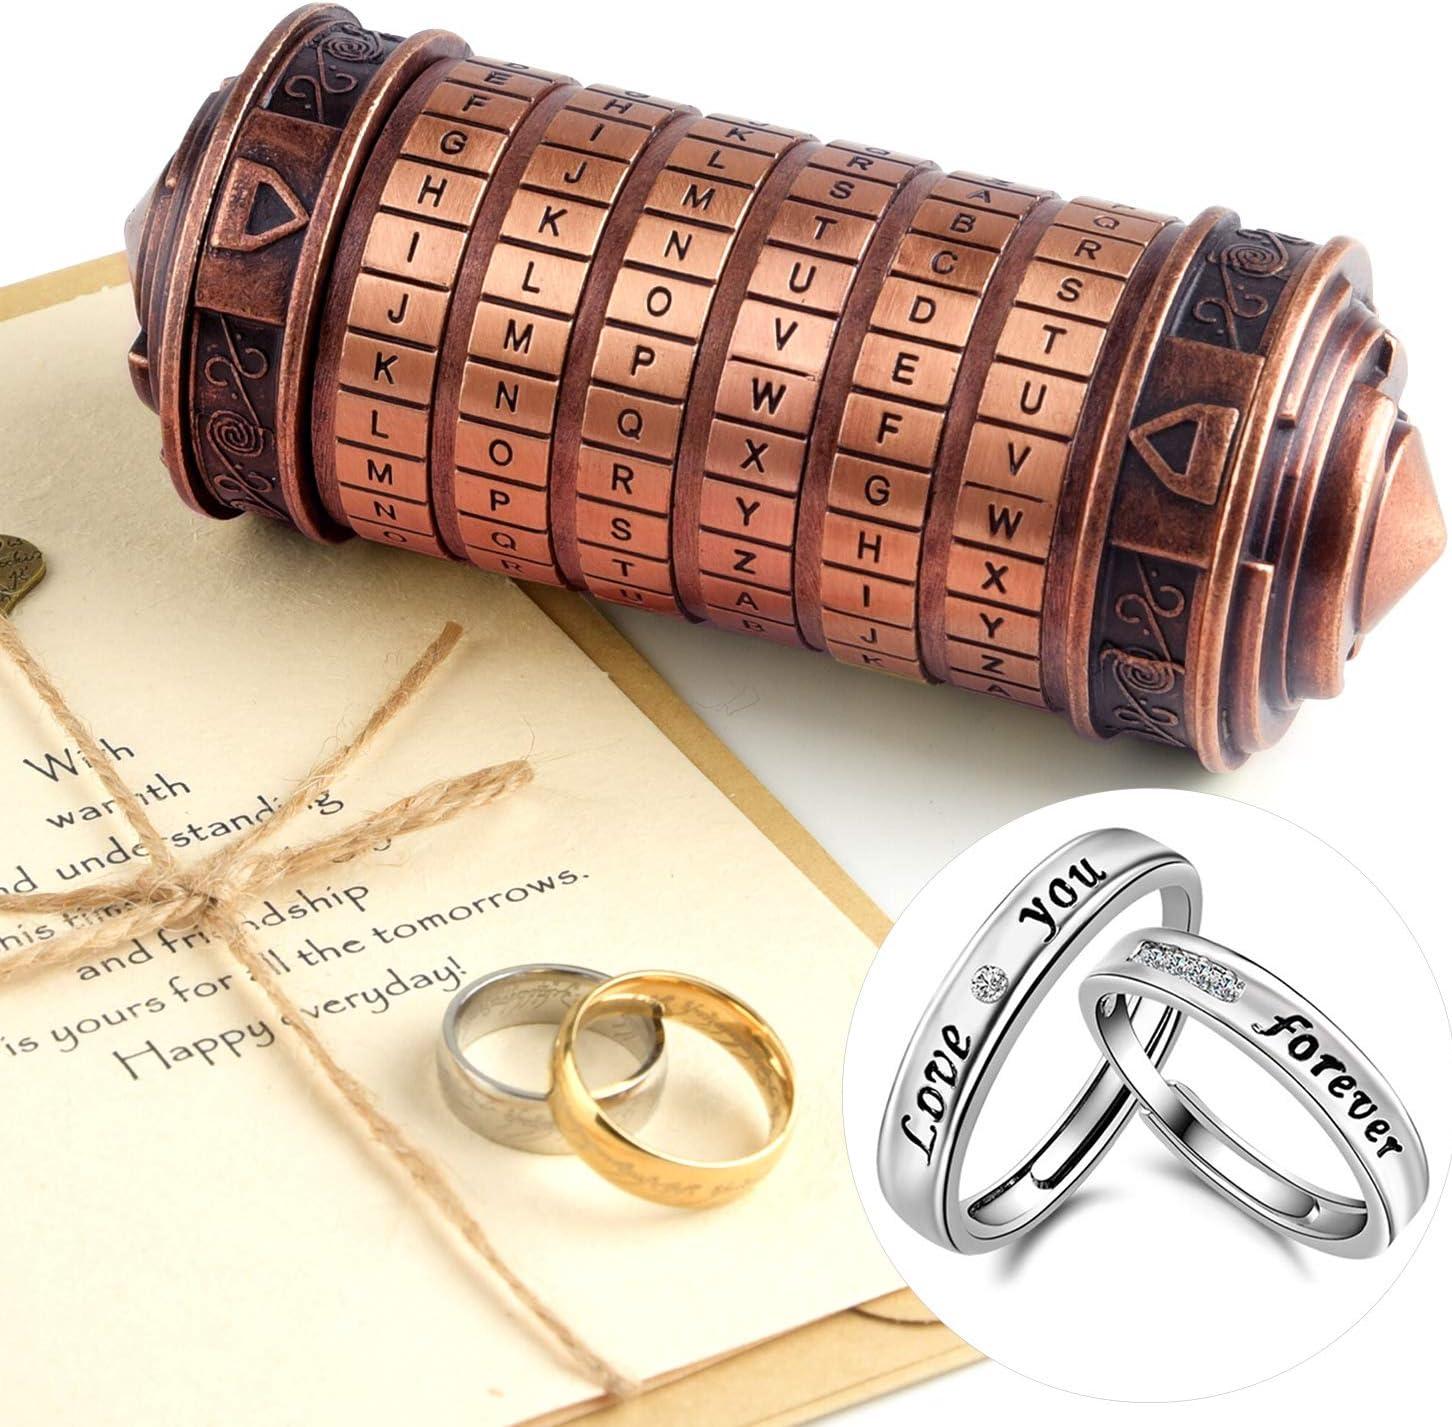 TUPARKA 5Pcs Da In a popularity Vinci Code Cryptex Boxes Valentine's Popular popular Puzzle Mini